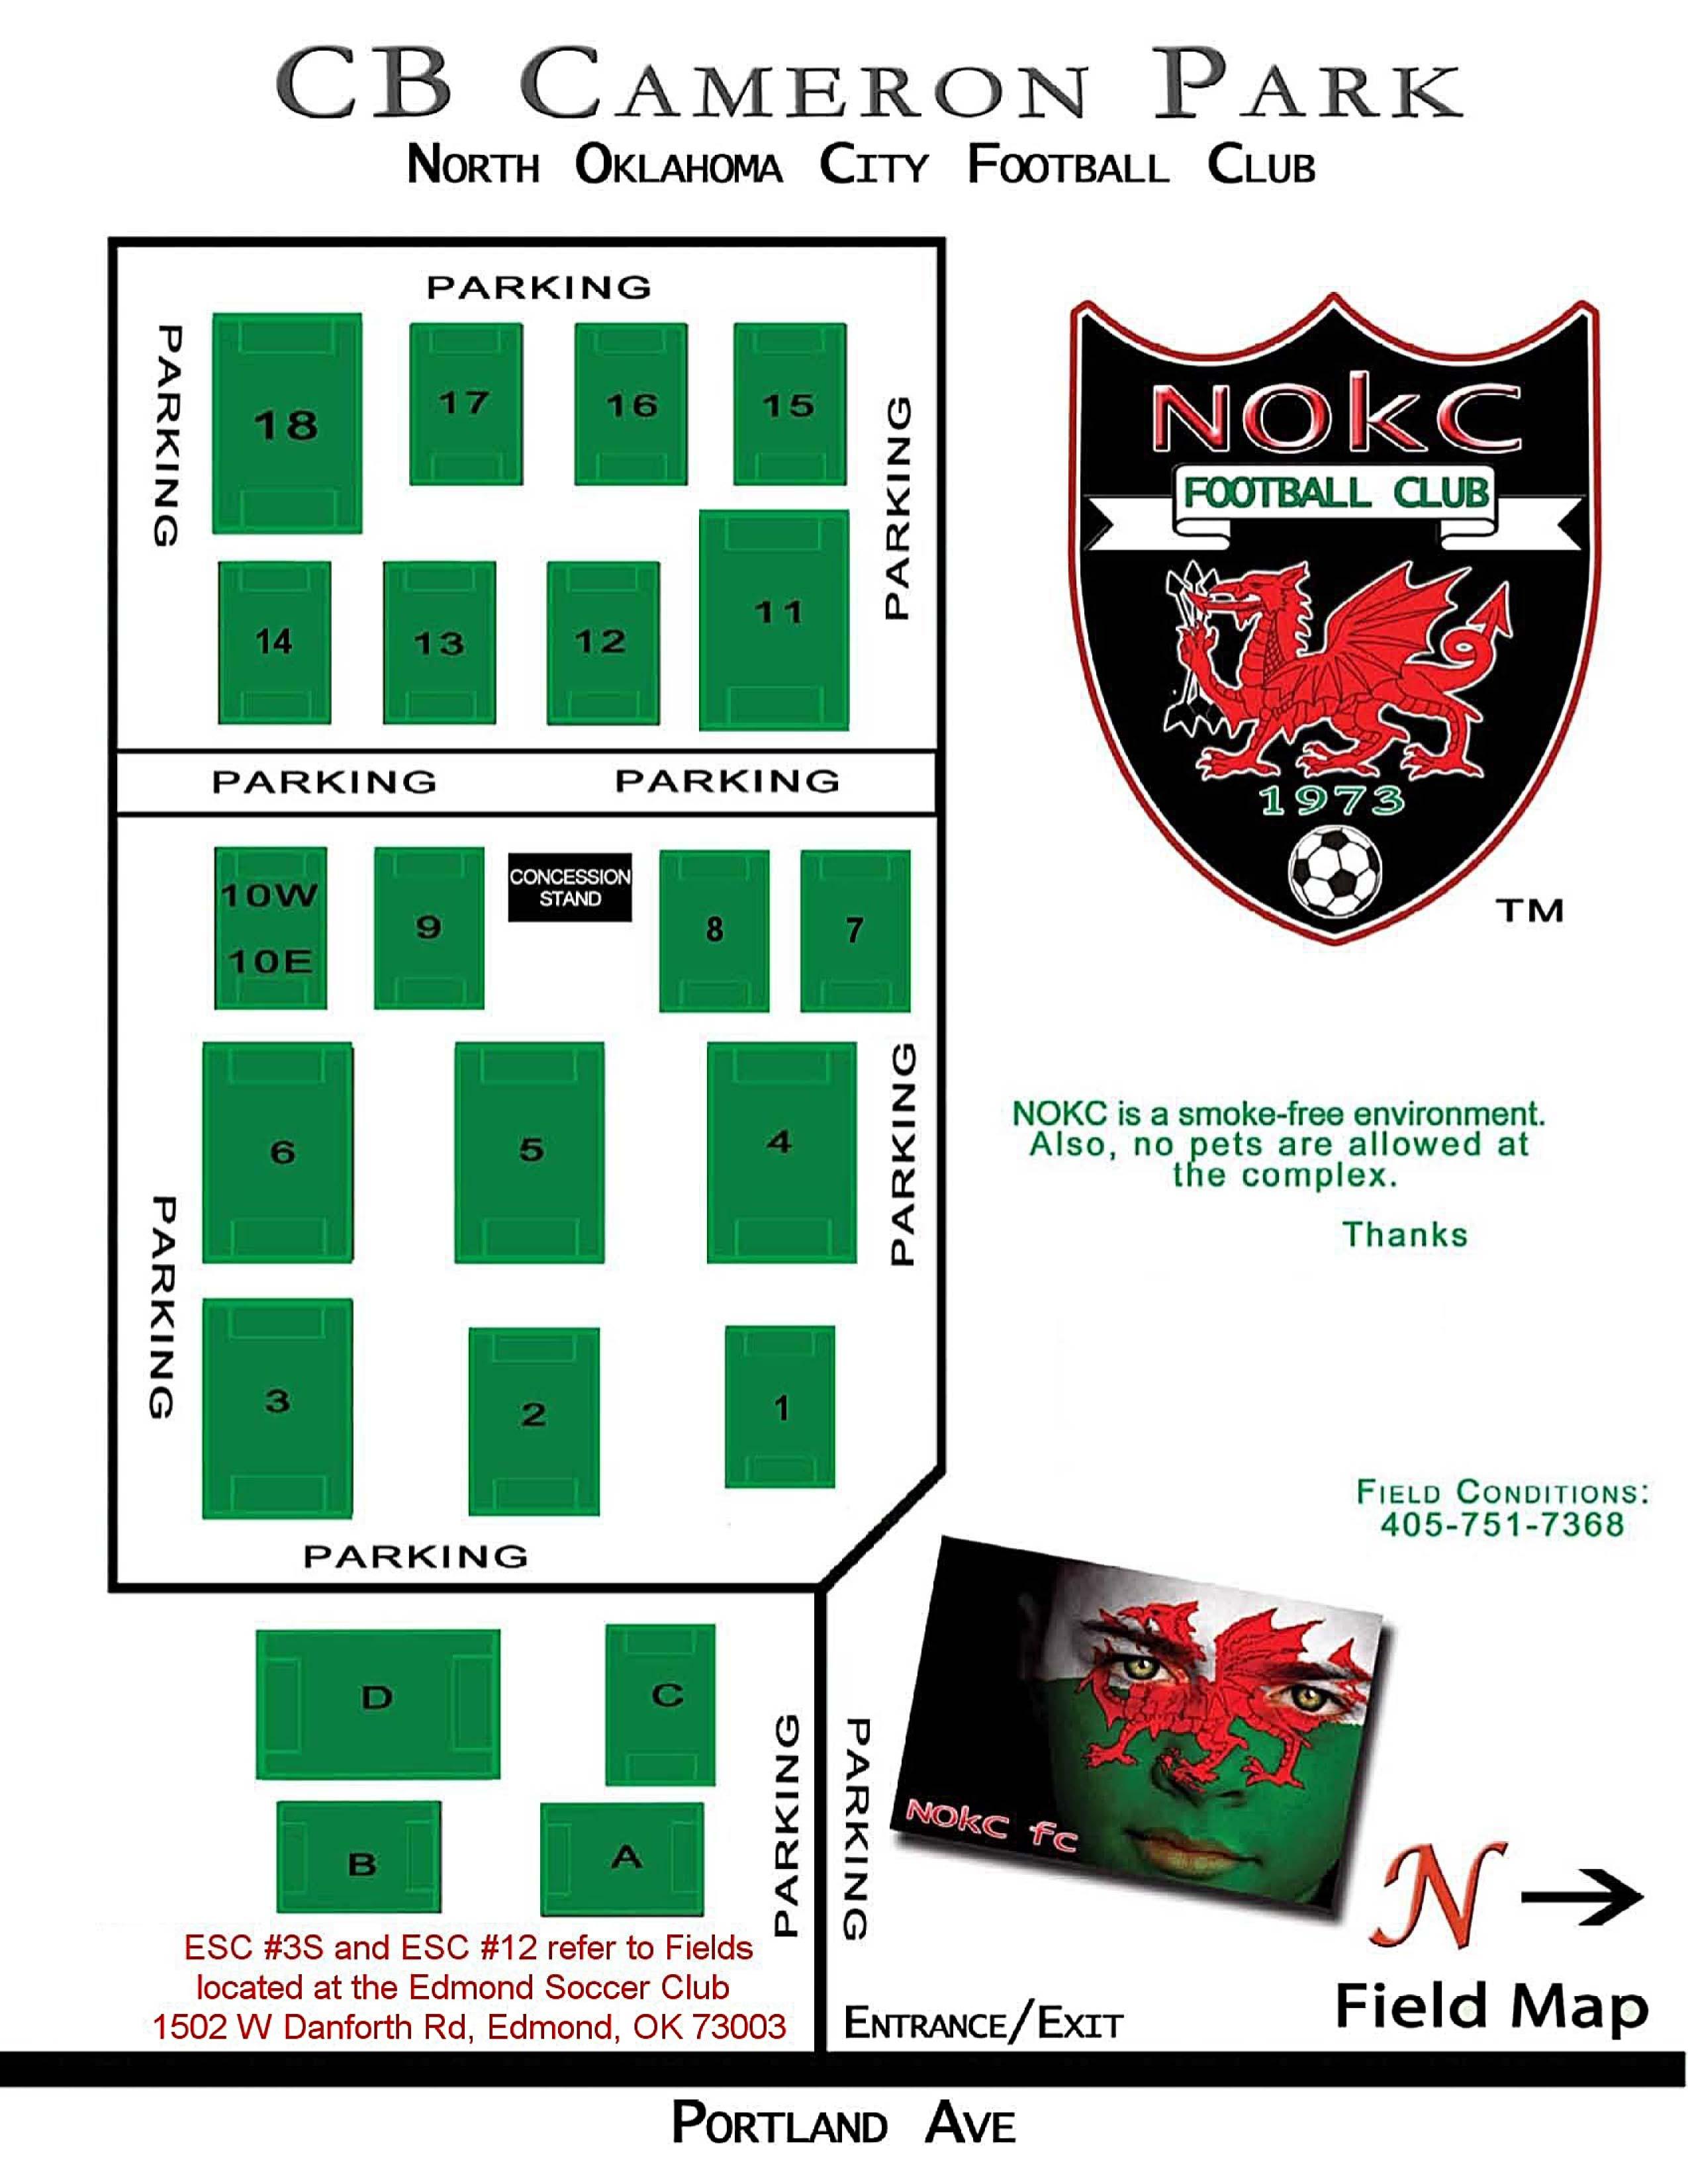 Edmond Soccer Club Field Map 2014 NOKC Field Map   North Oklahoma City Soccer Club Edmond Soccer Club Field Map